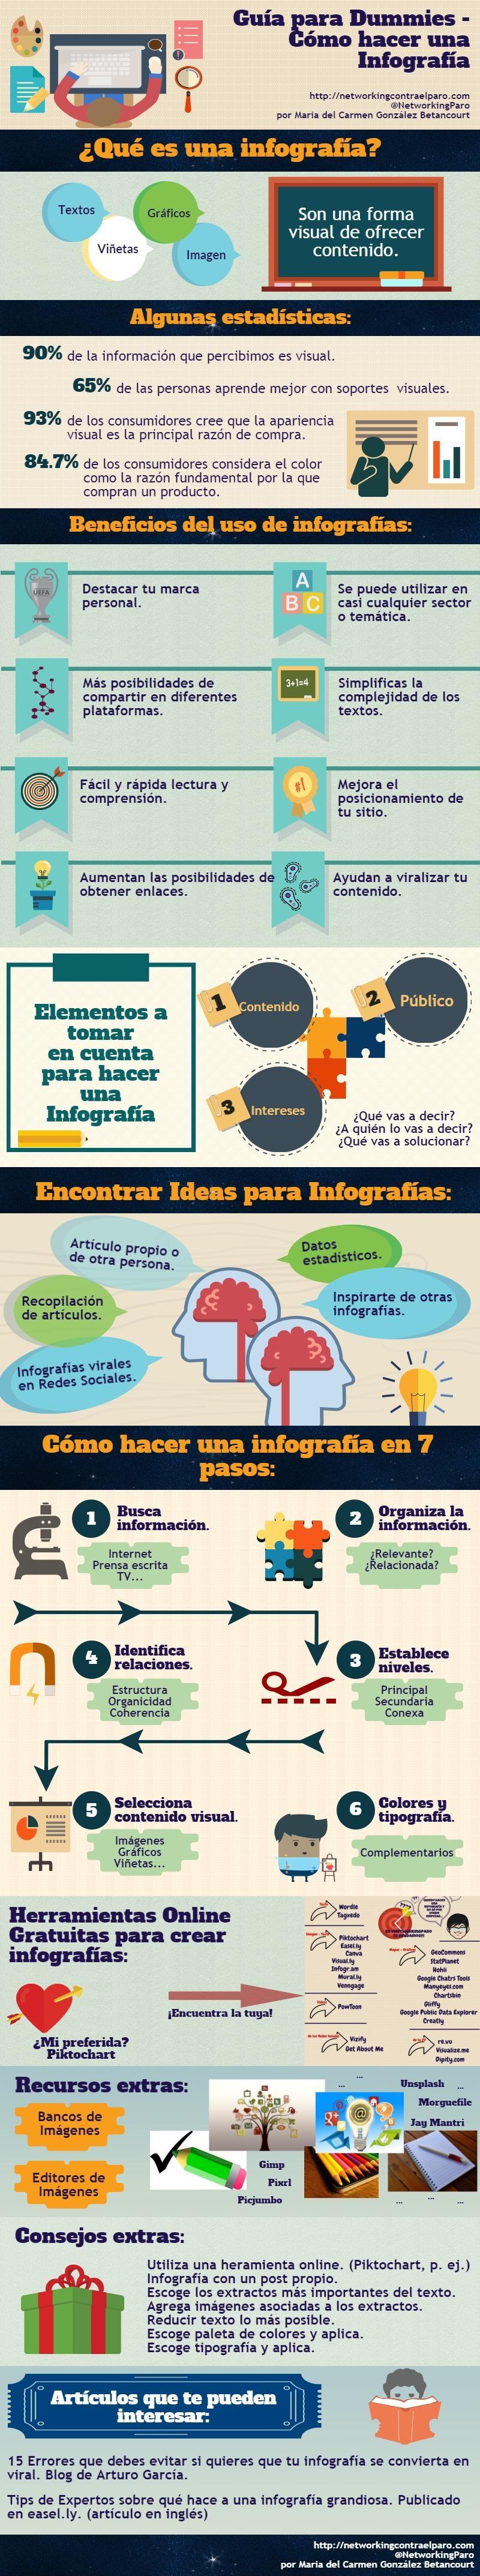 Guía para dummies sobre cómo crear infografías